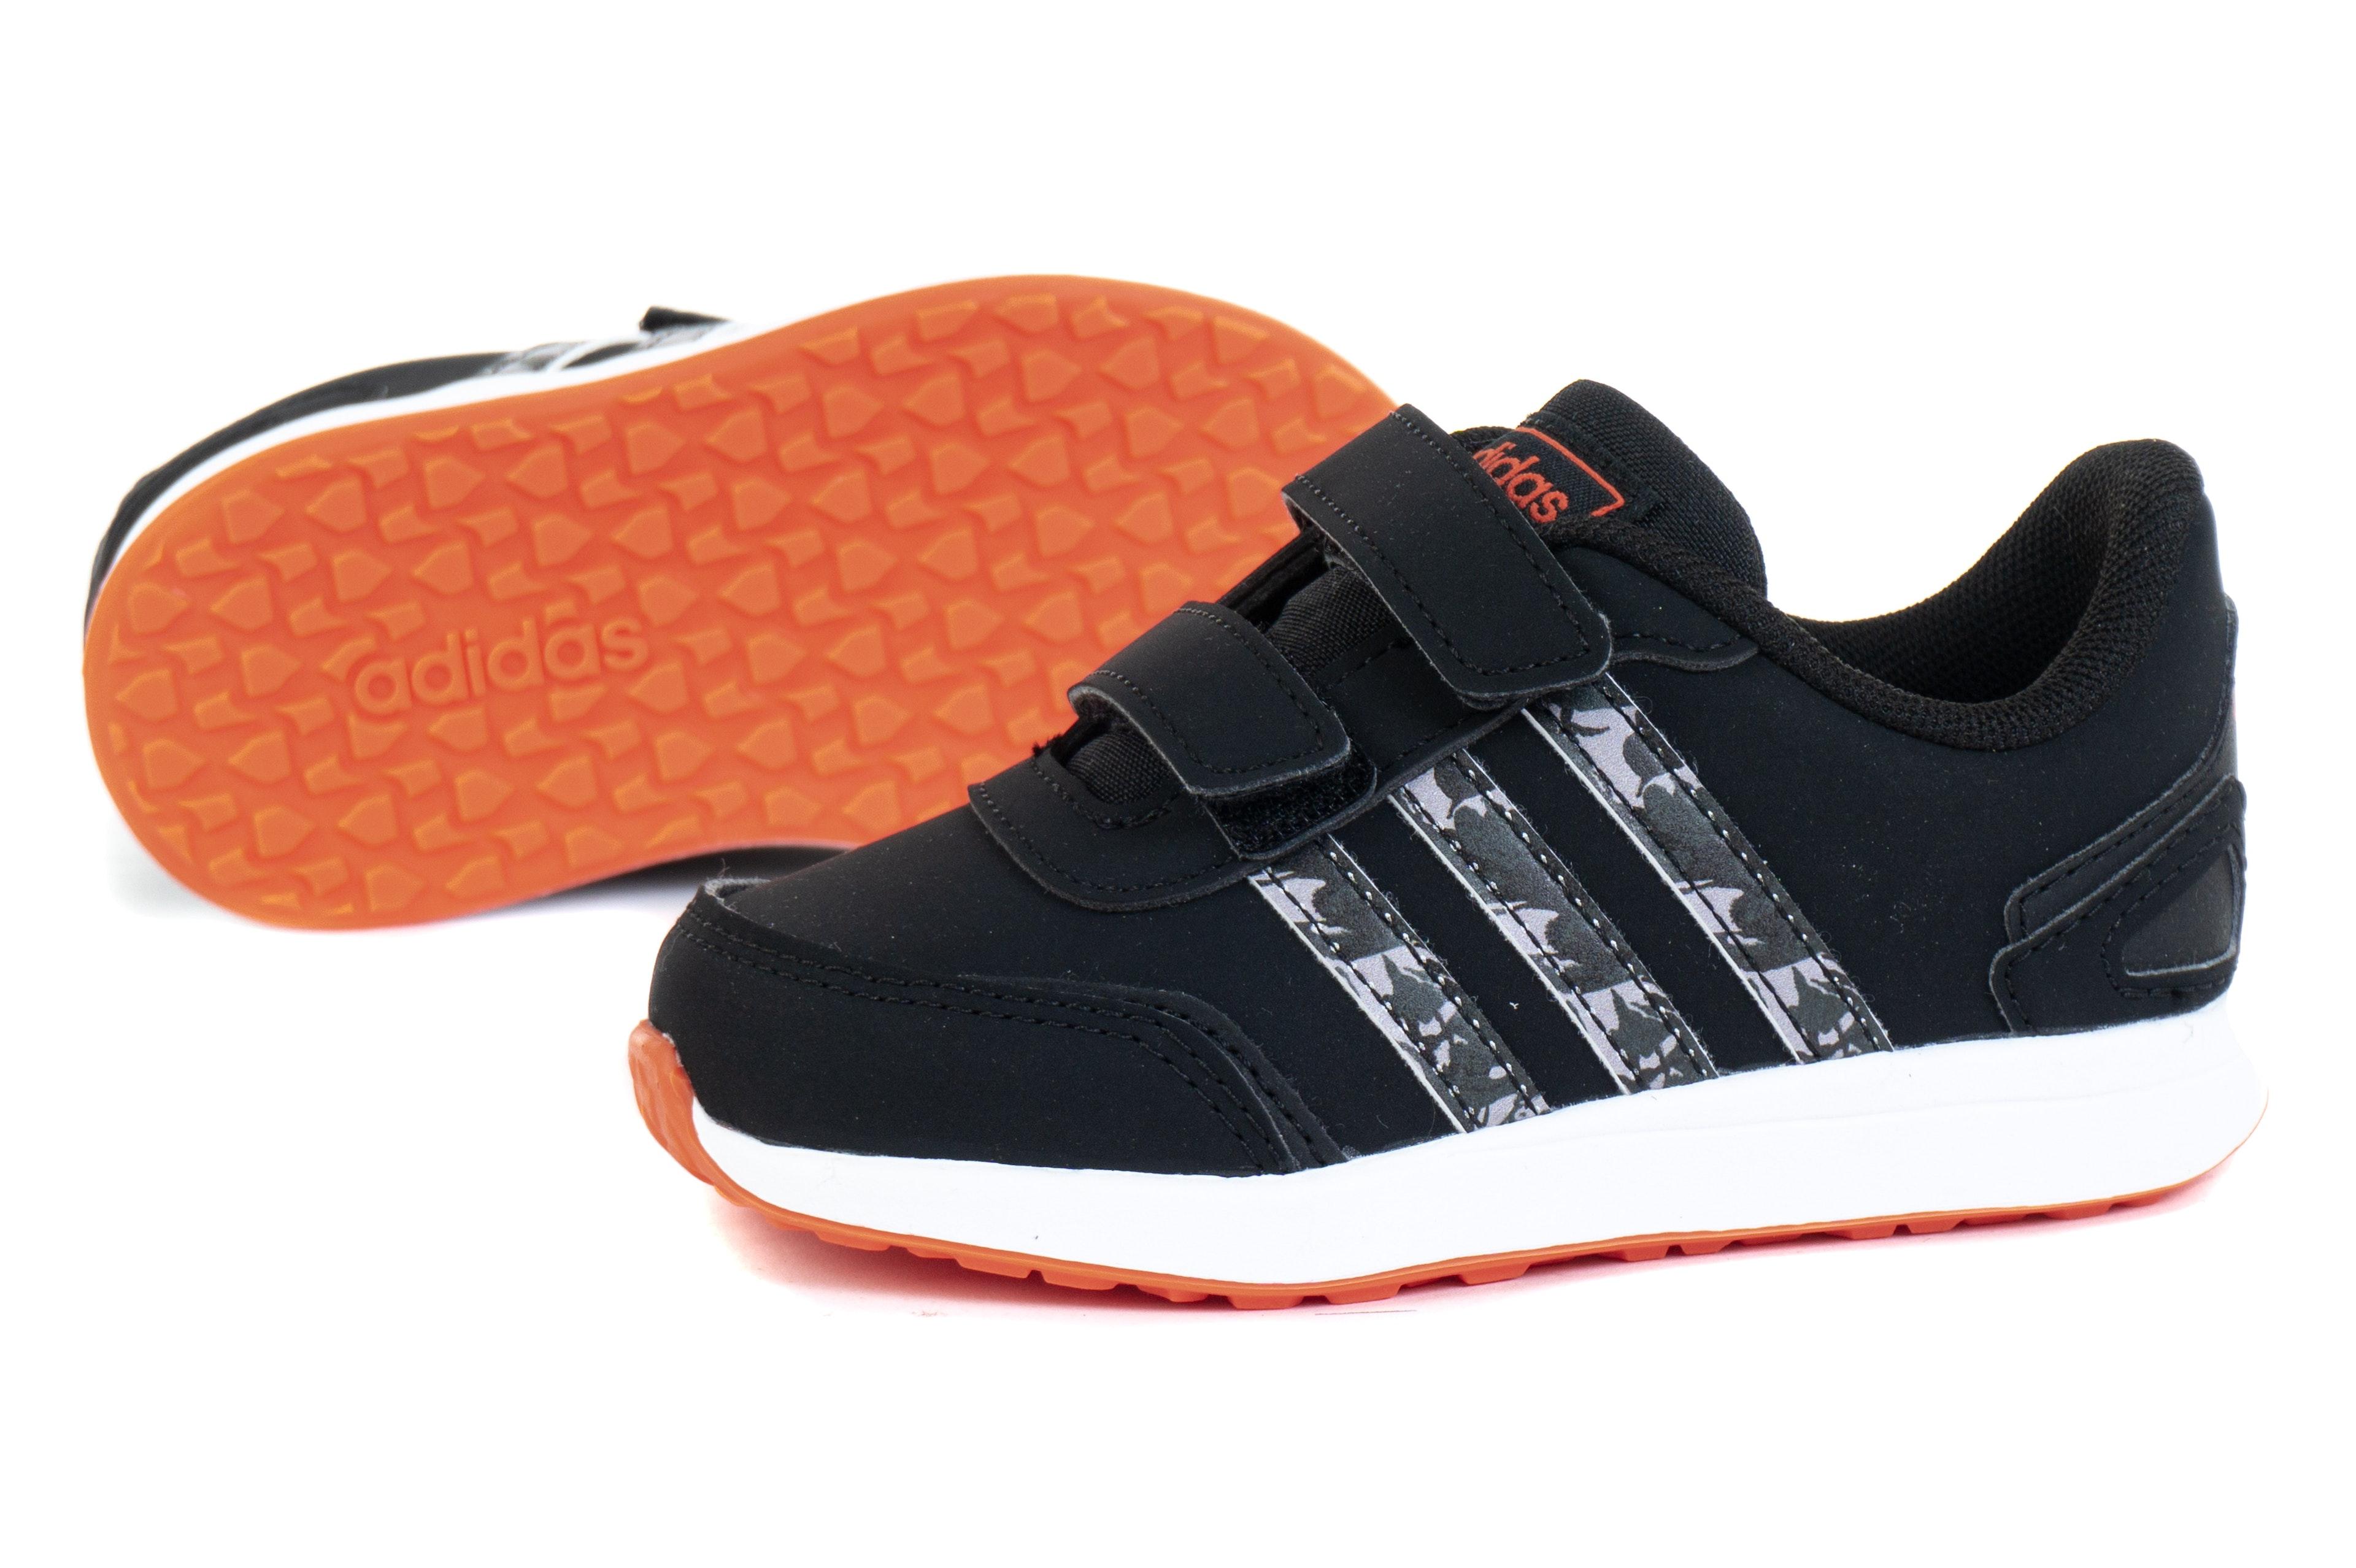 adidas VS SWITCH 3 I FY9228